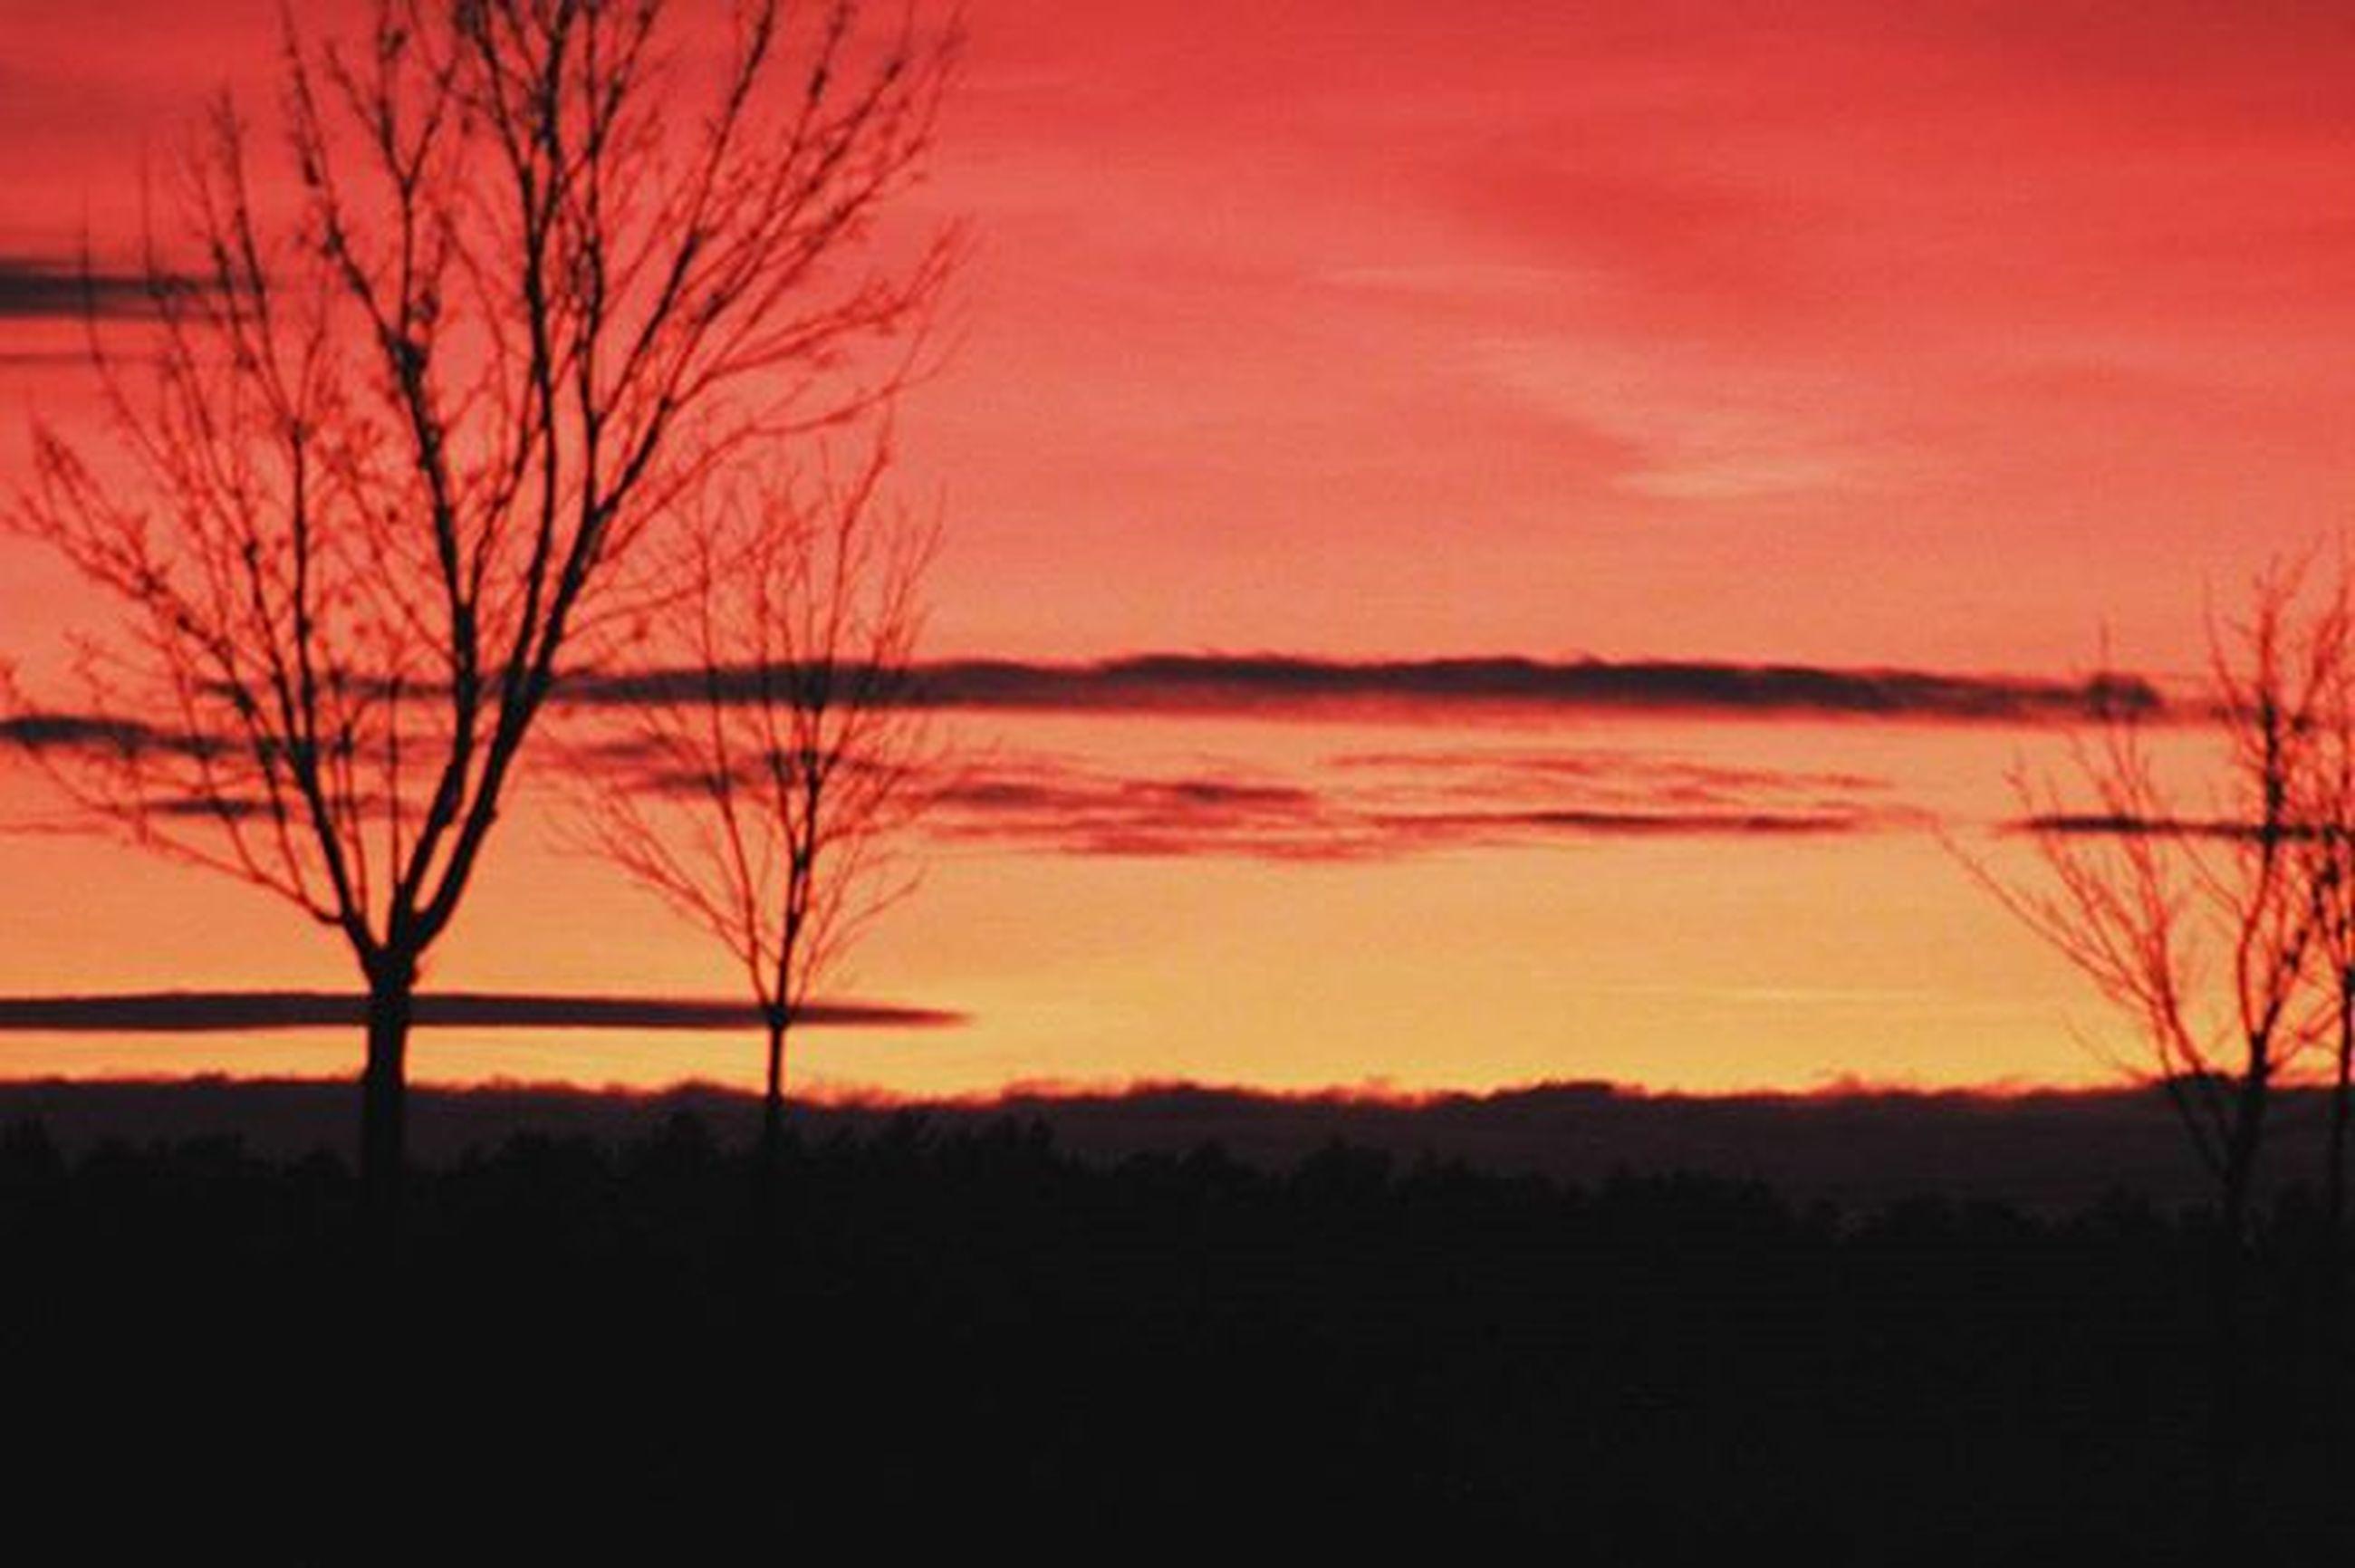 sunset, silhouette, bare tree, tranquil scene, tranquility, scenics, orange color, beauty in nature, sky, tree, landscape, idyllic, nature, dramatic sky, dark, cloud - sky, majestic, dusk, non-urban scene, branch